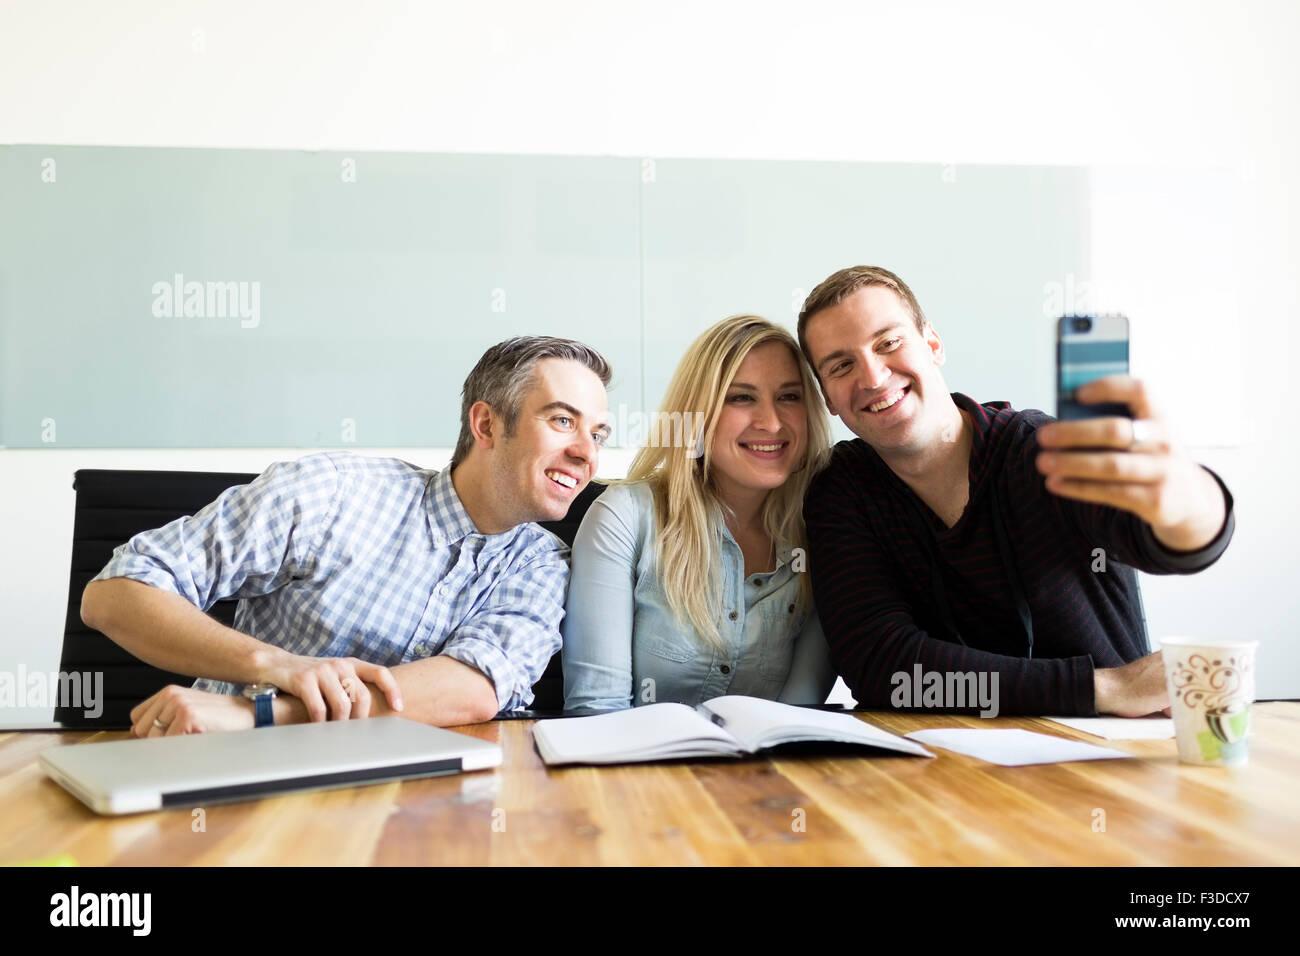 Office workers taking selfie - Stock Image